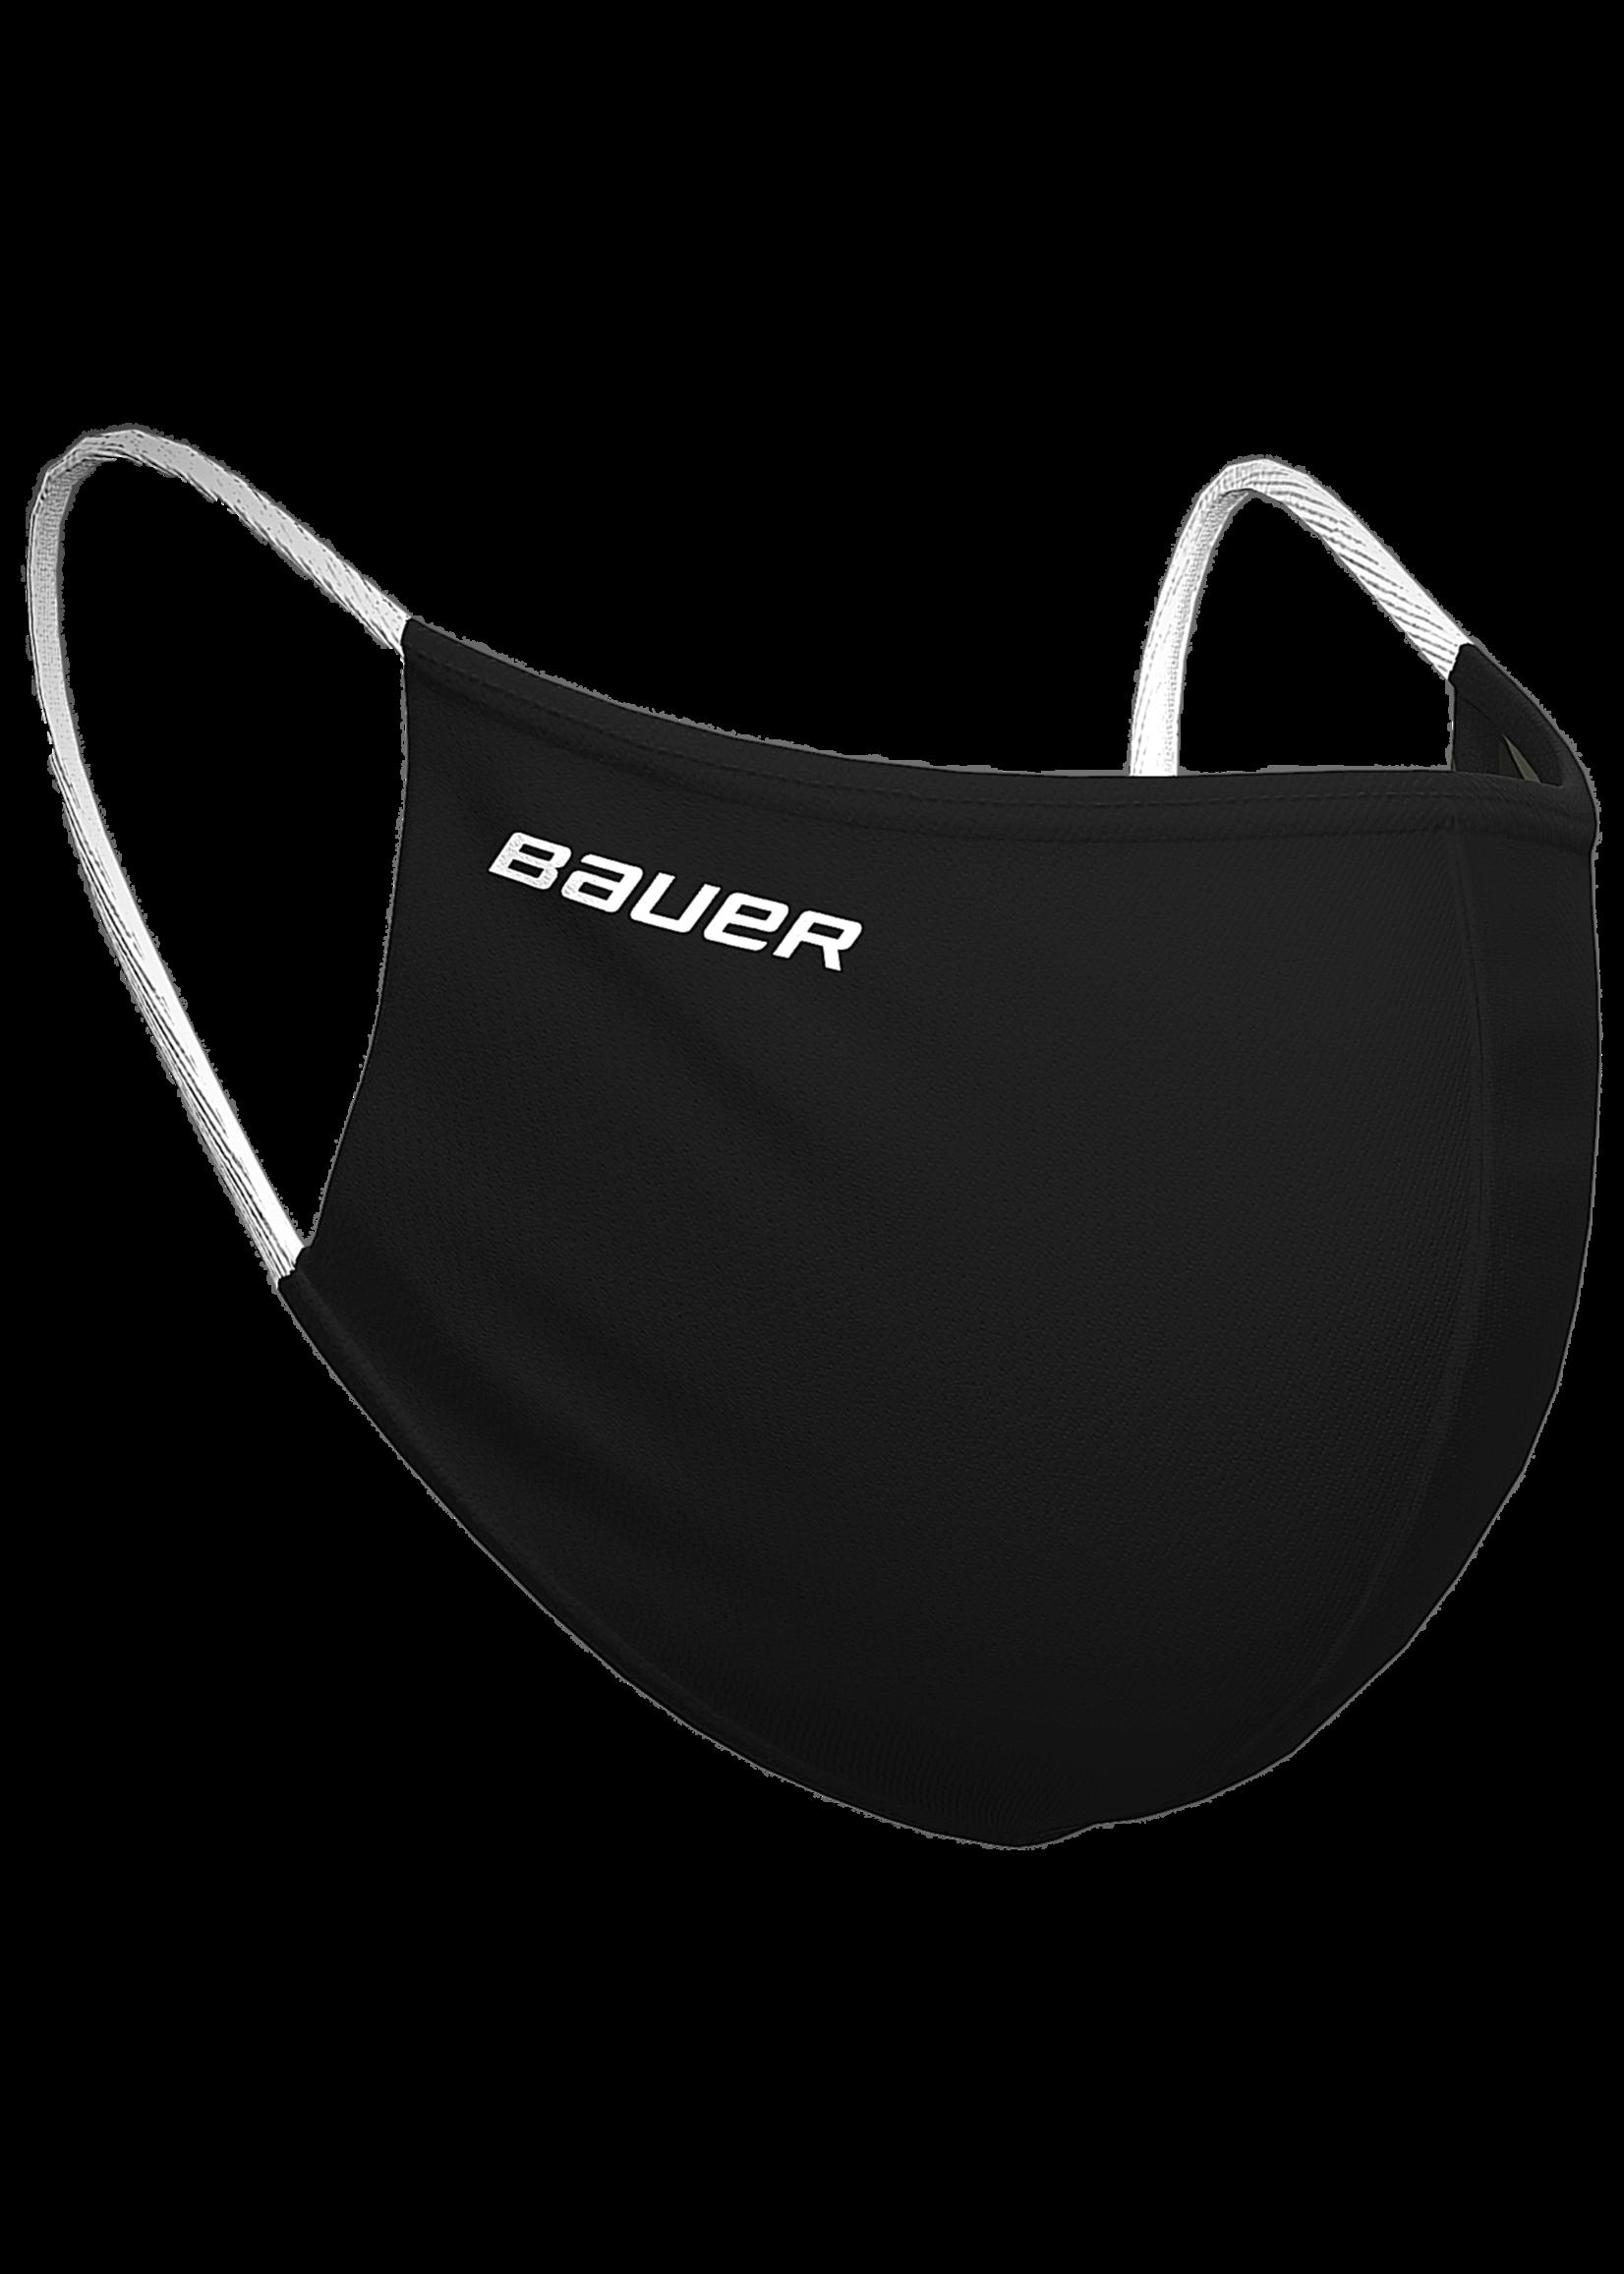 Bauer Hockey - Canada MASQUE BAUER RÉVERSIBLE BLACK/CAMO